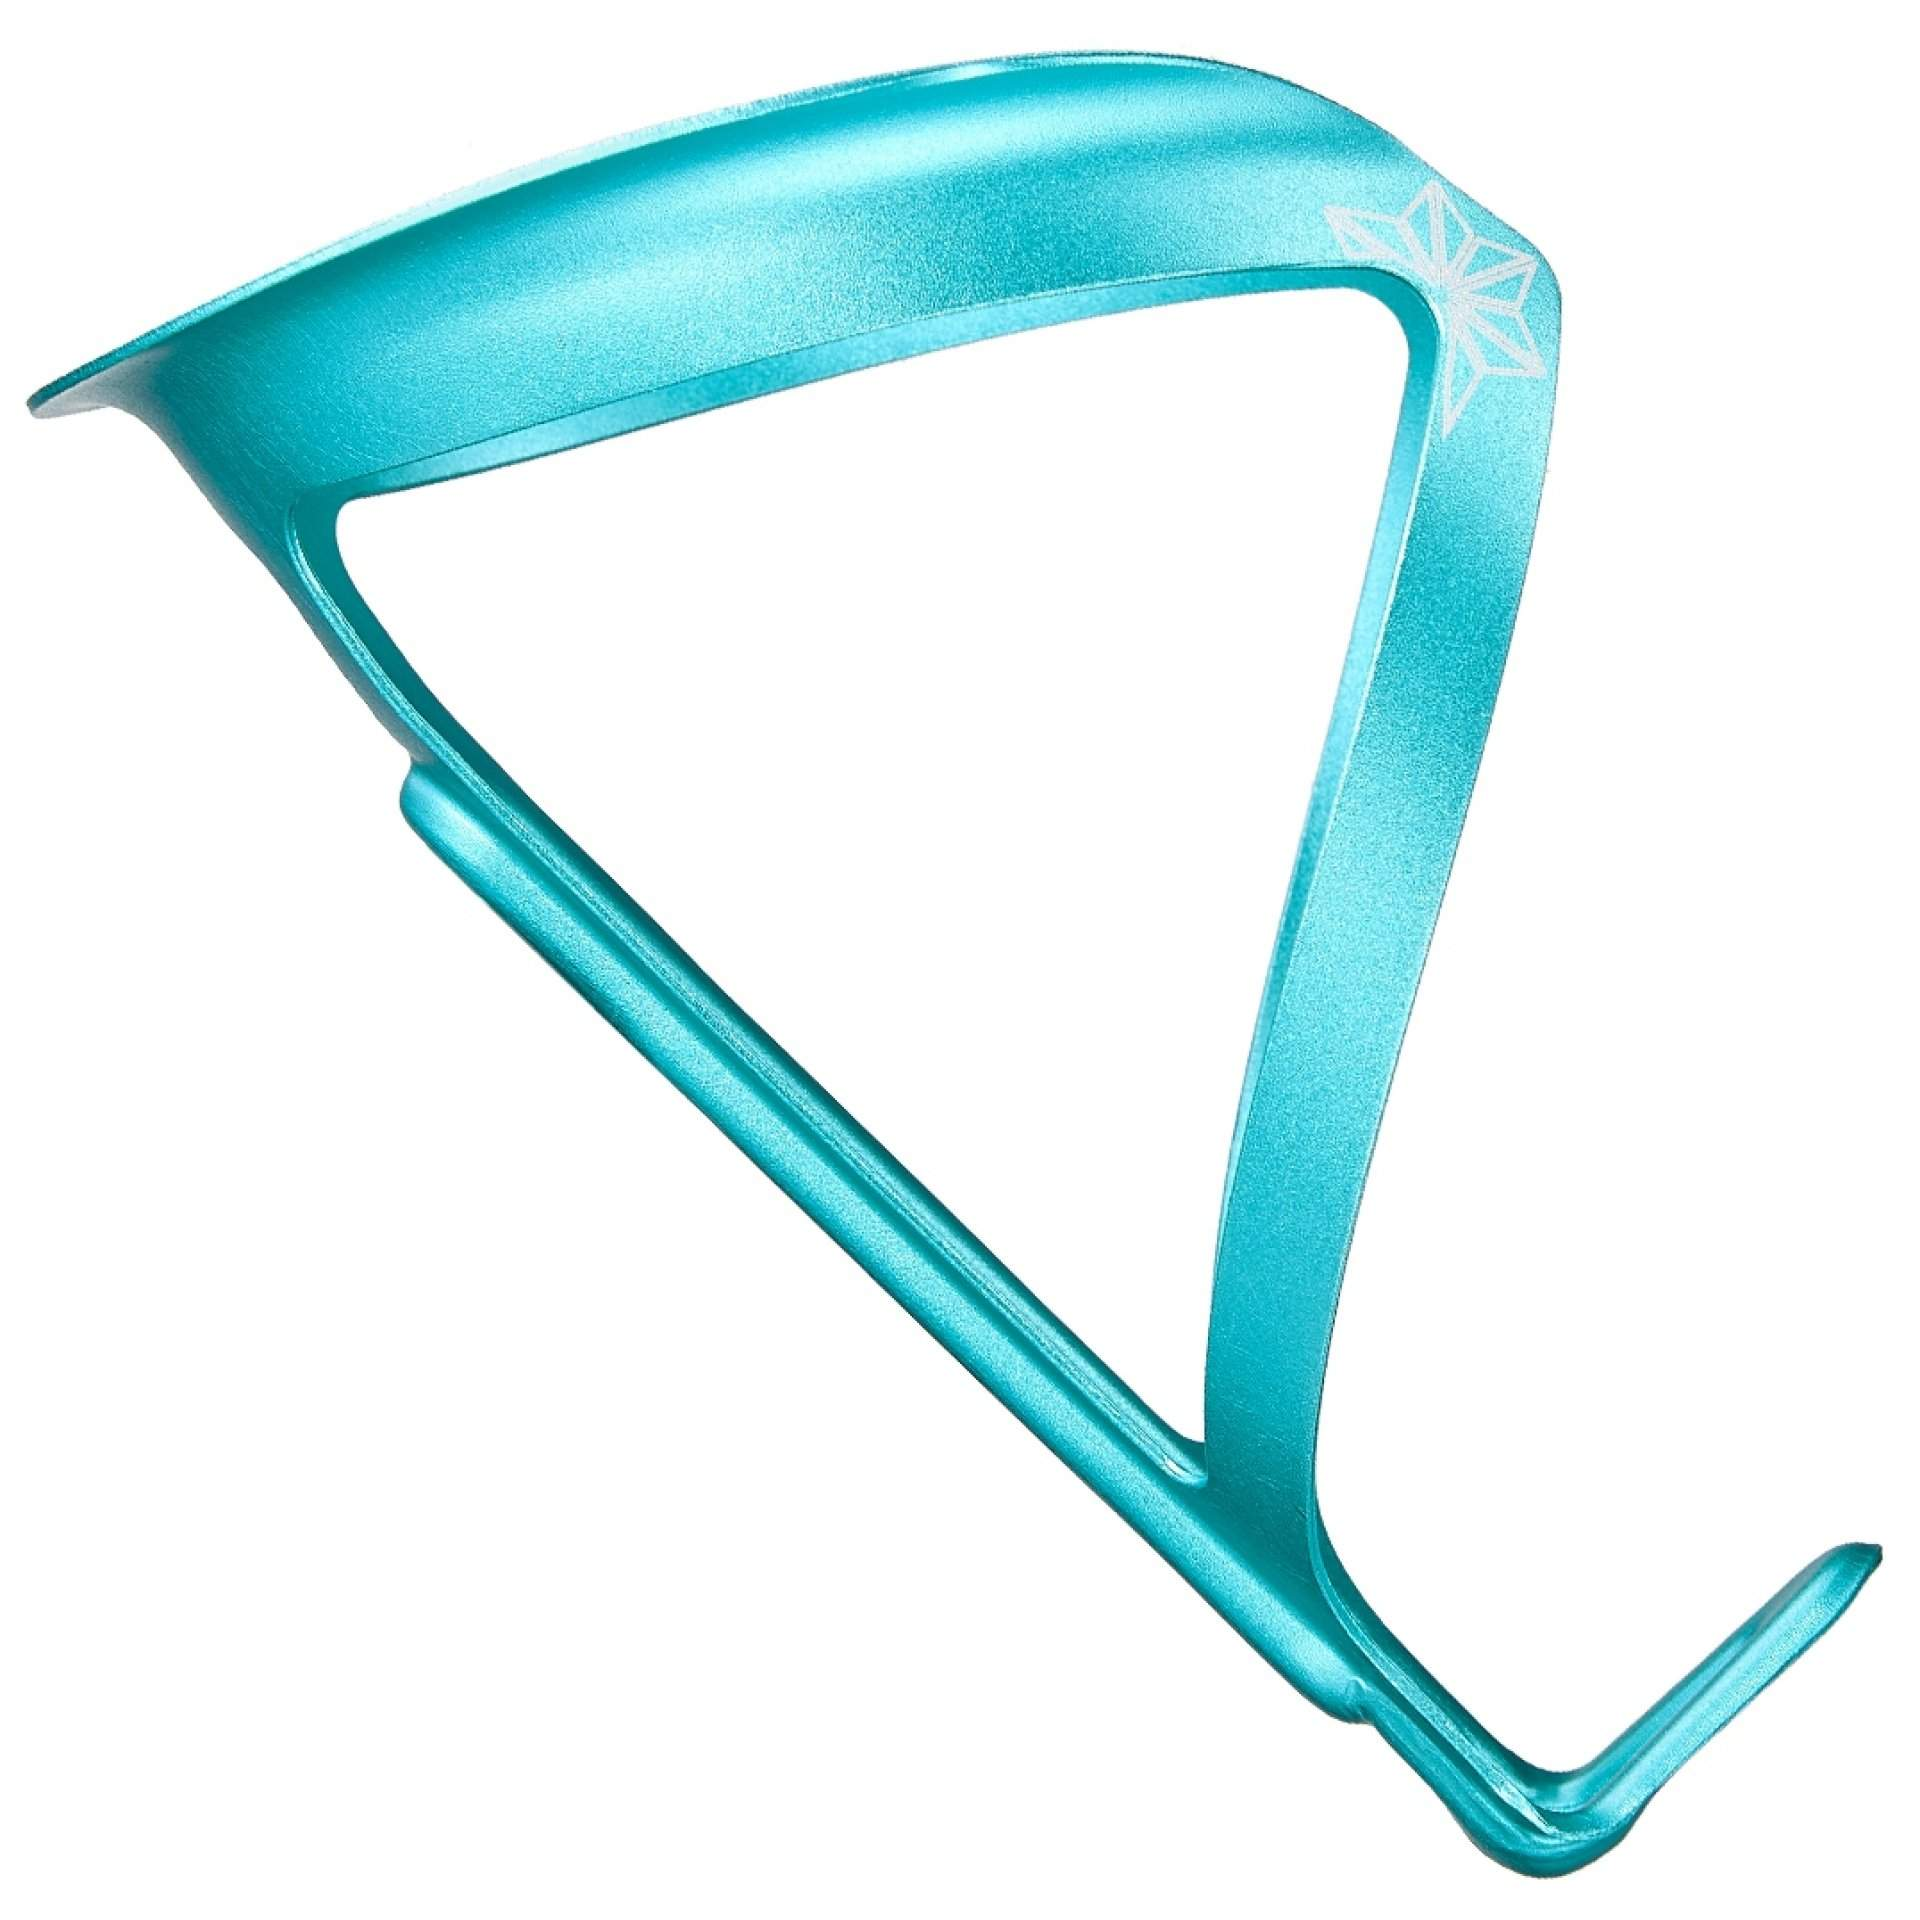 KOSZYK NA BIDON ROWEROWY SUPACAZ FLY CAGE ANO CG65 ICE BLUE